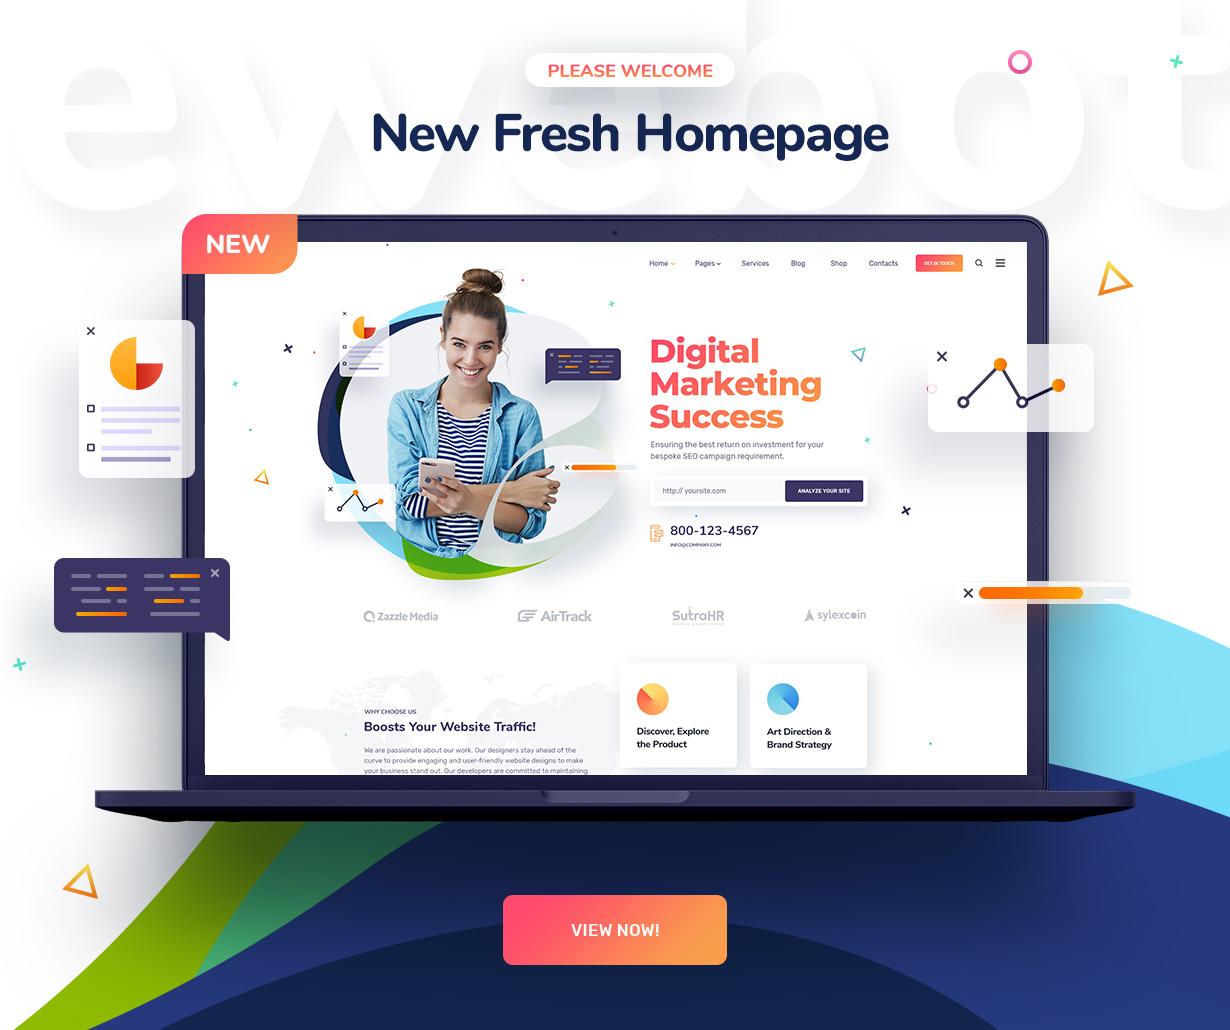 ewebot homepage10 - Ewebot - SEO Marketing & Digital Agency